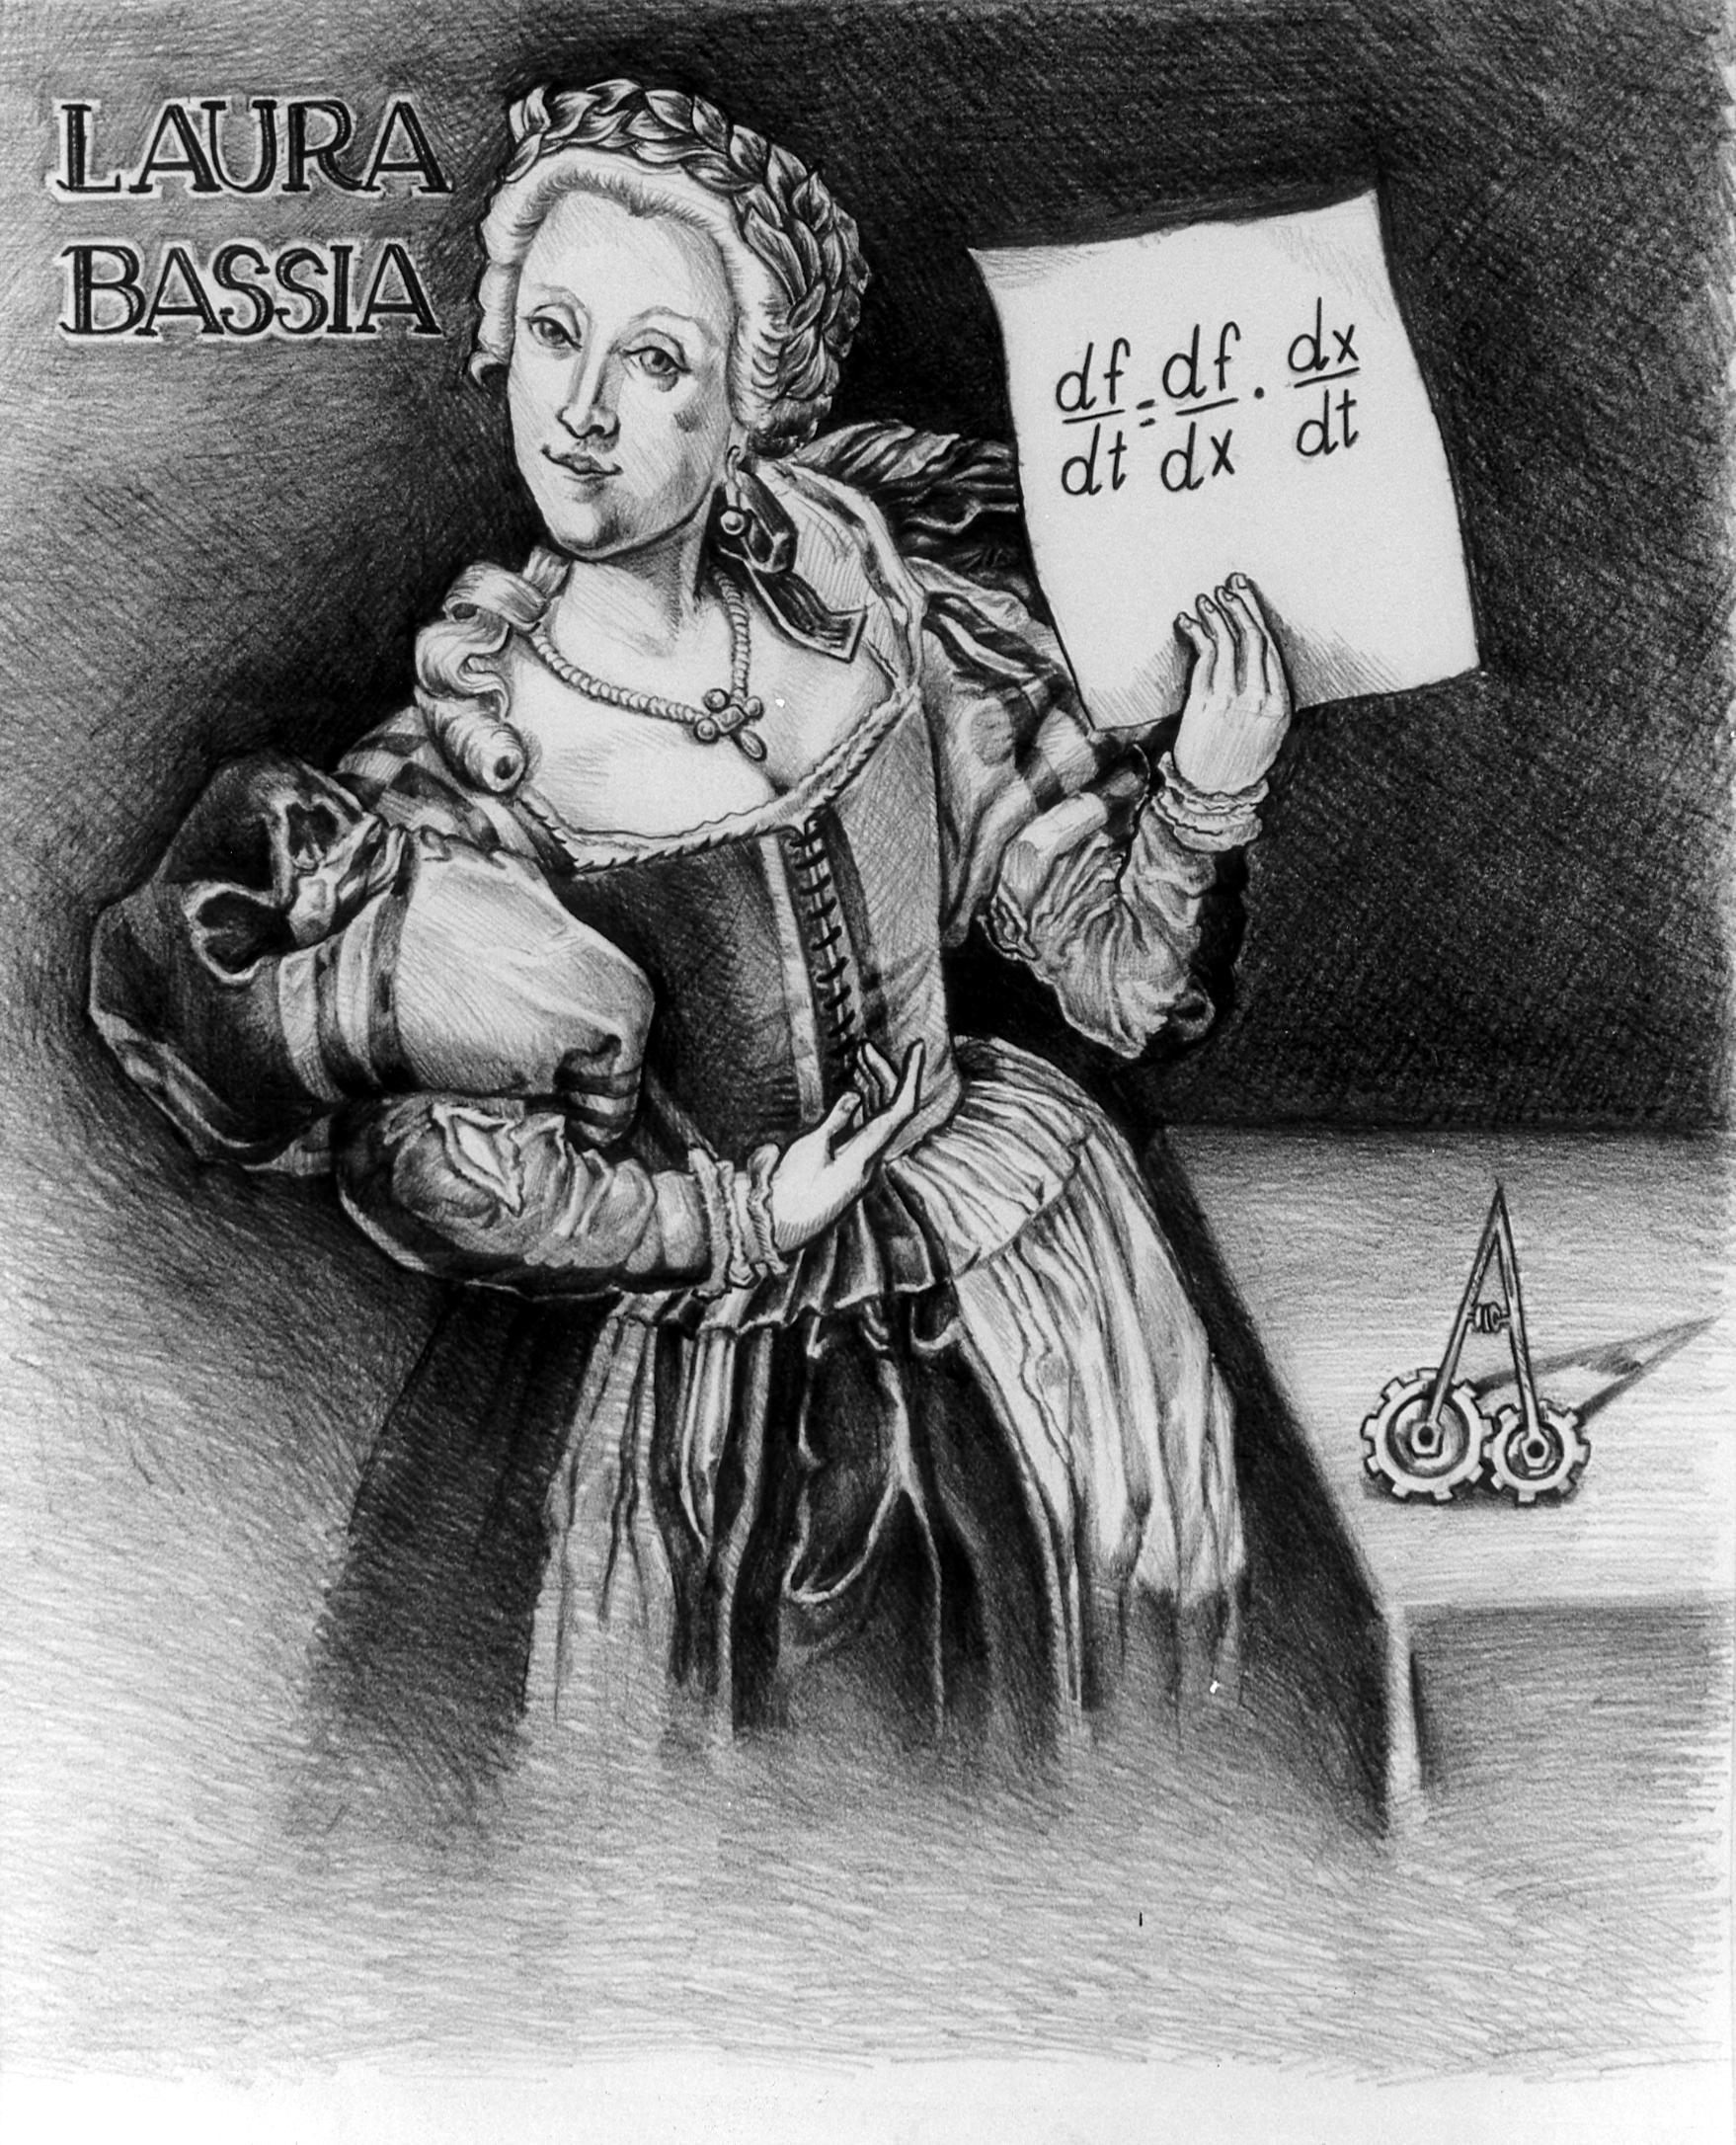 Laura Bassia (1711, 1778)